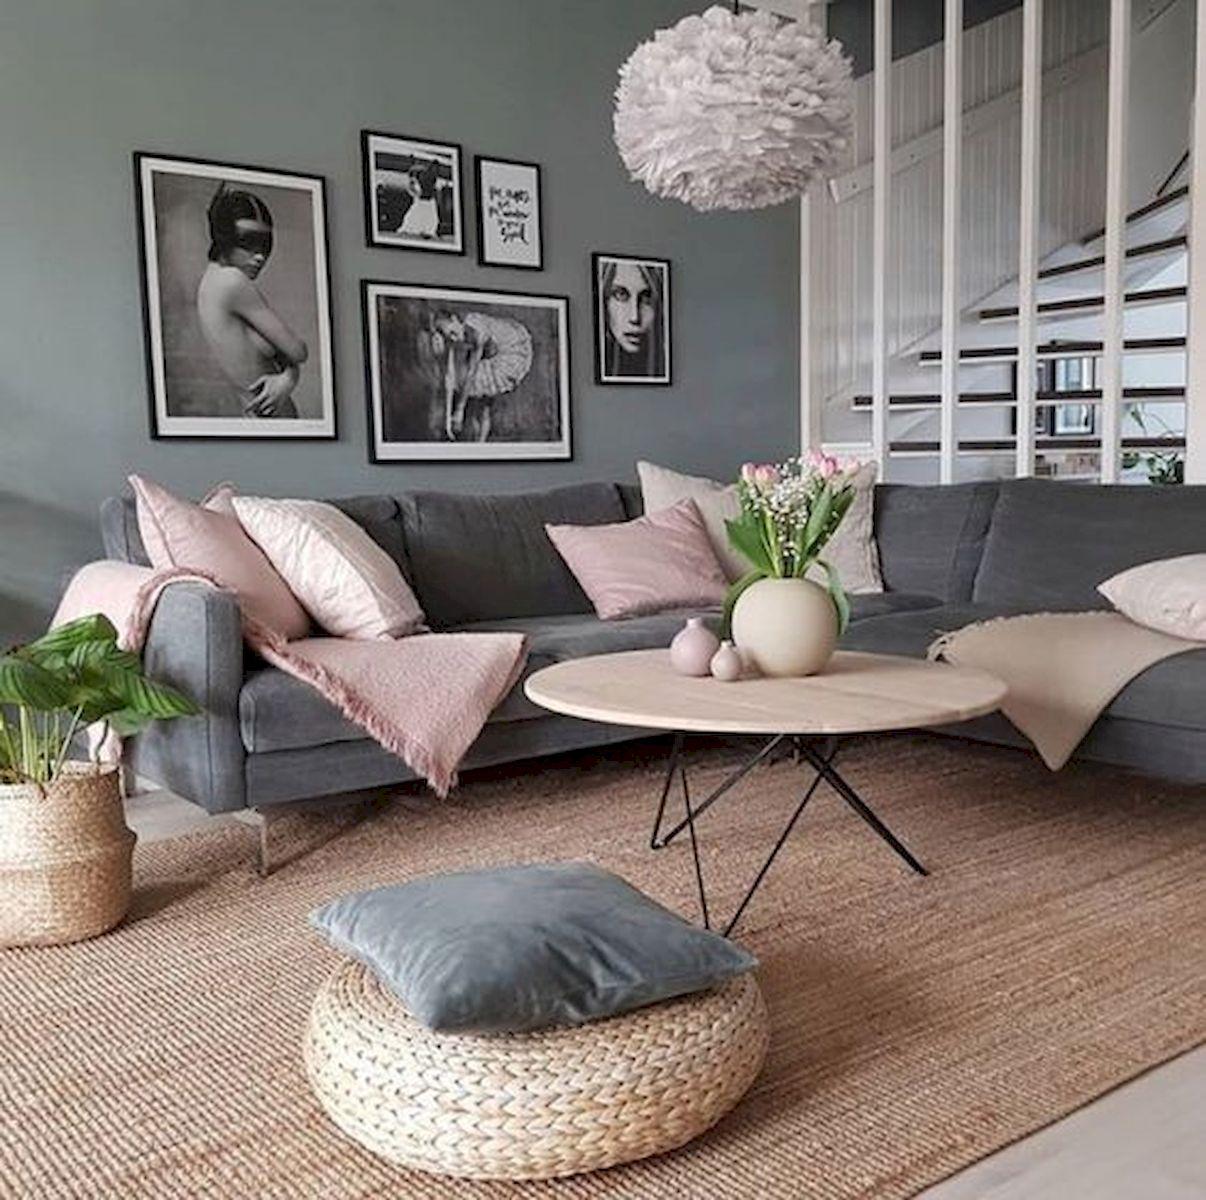 50 Gorgeous Living Room Decor and Design Ideas (15)